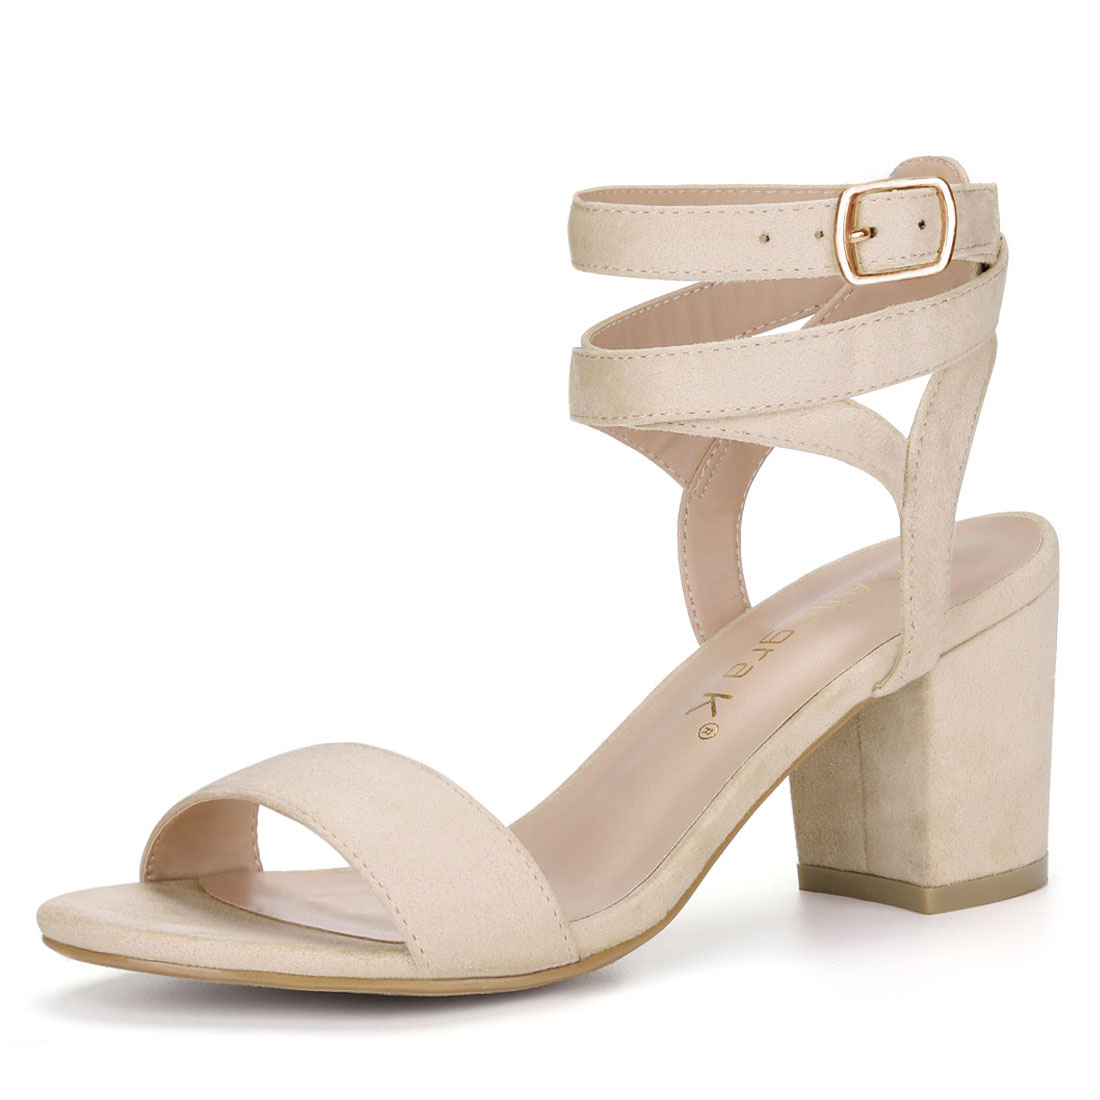 Allegra K Women's Block Heels Double Ankle Straps Sandals BeigeUS 9